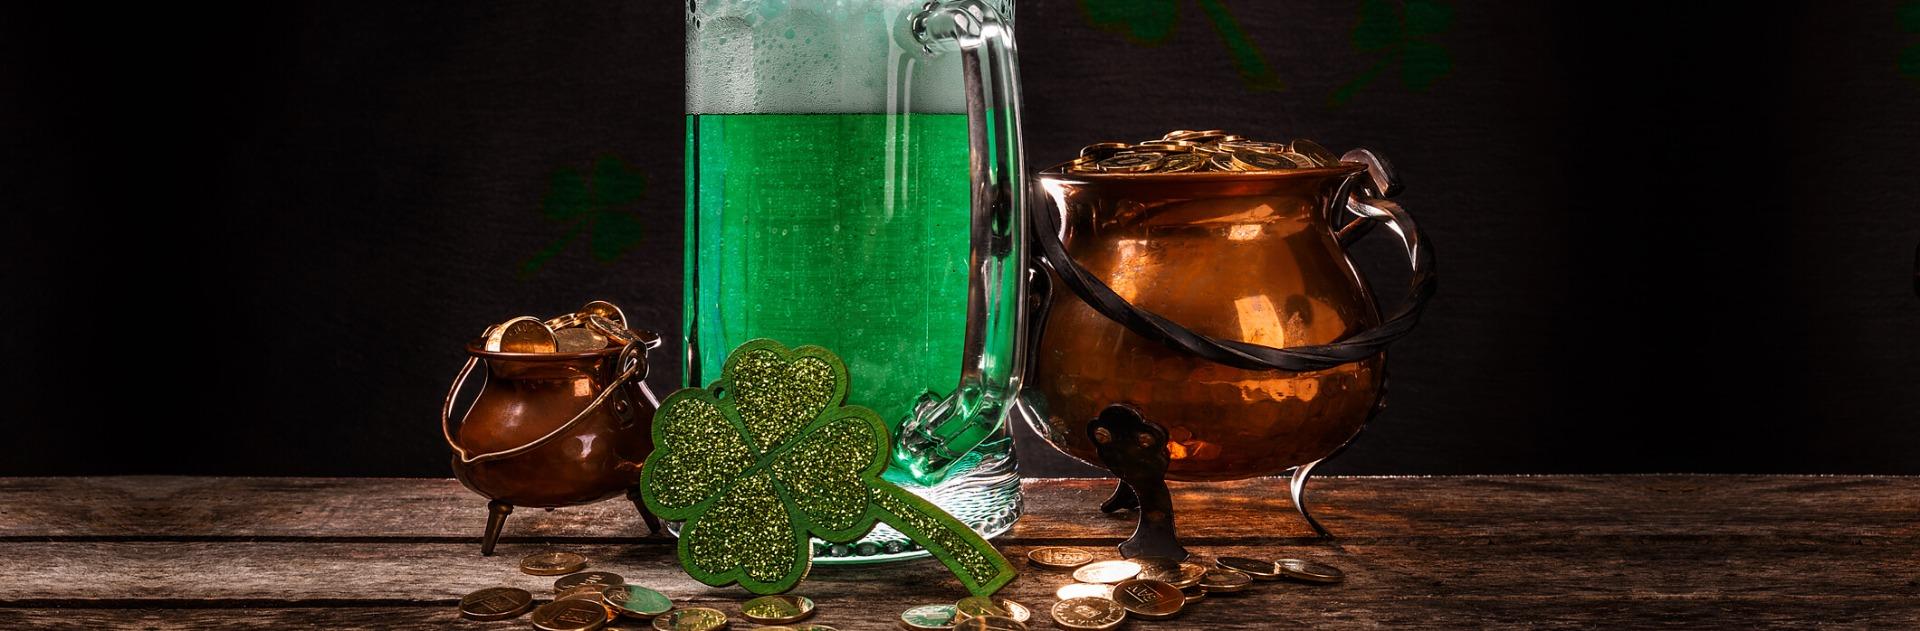 St. Patrick's Day Gift Baskets Monson